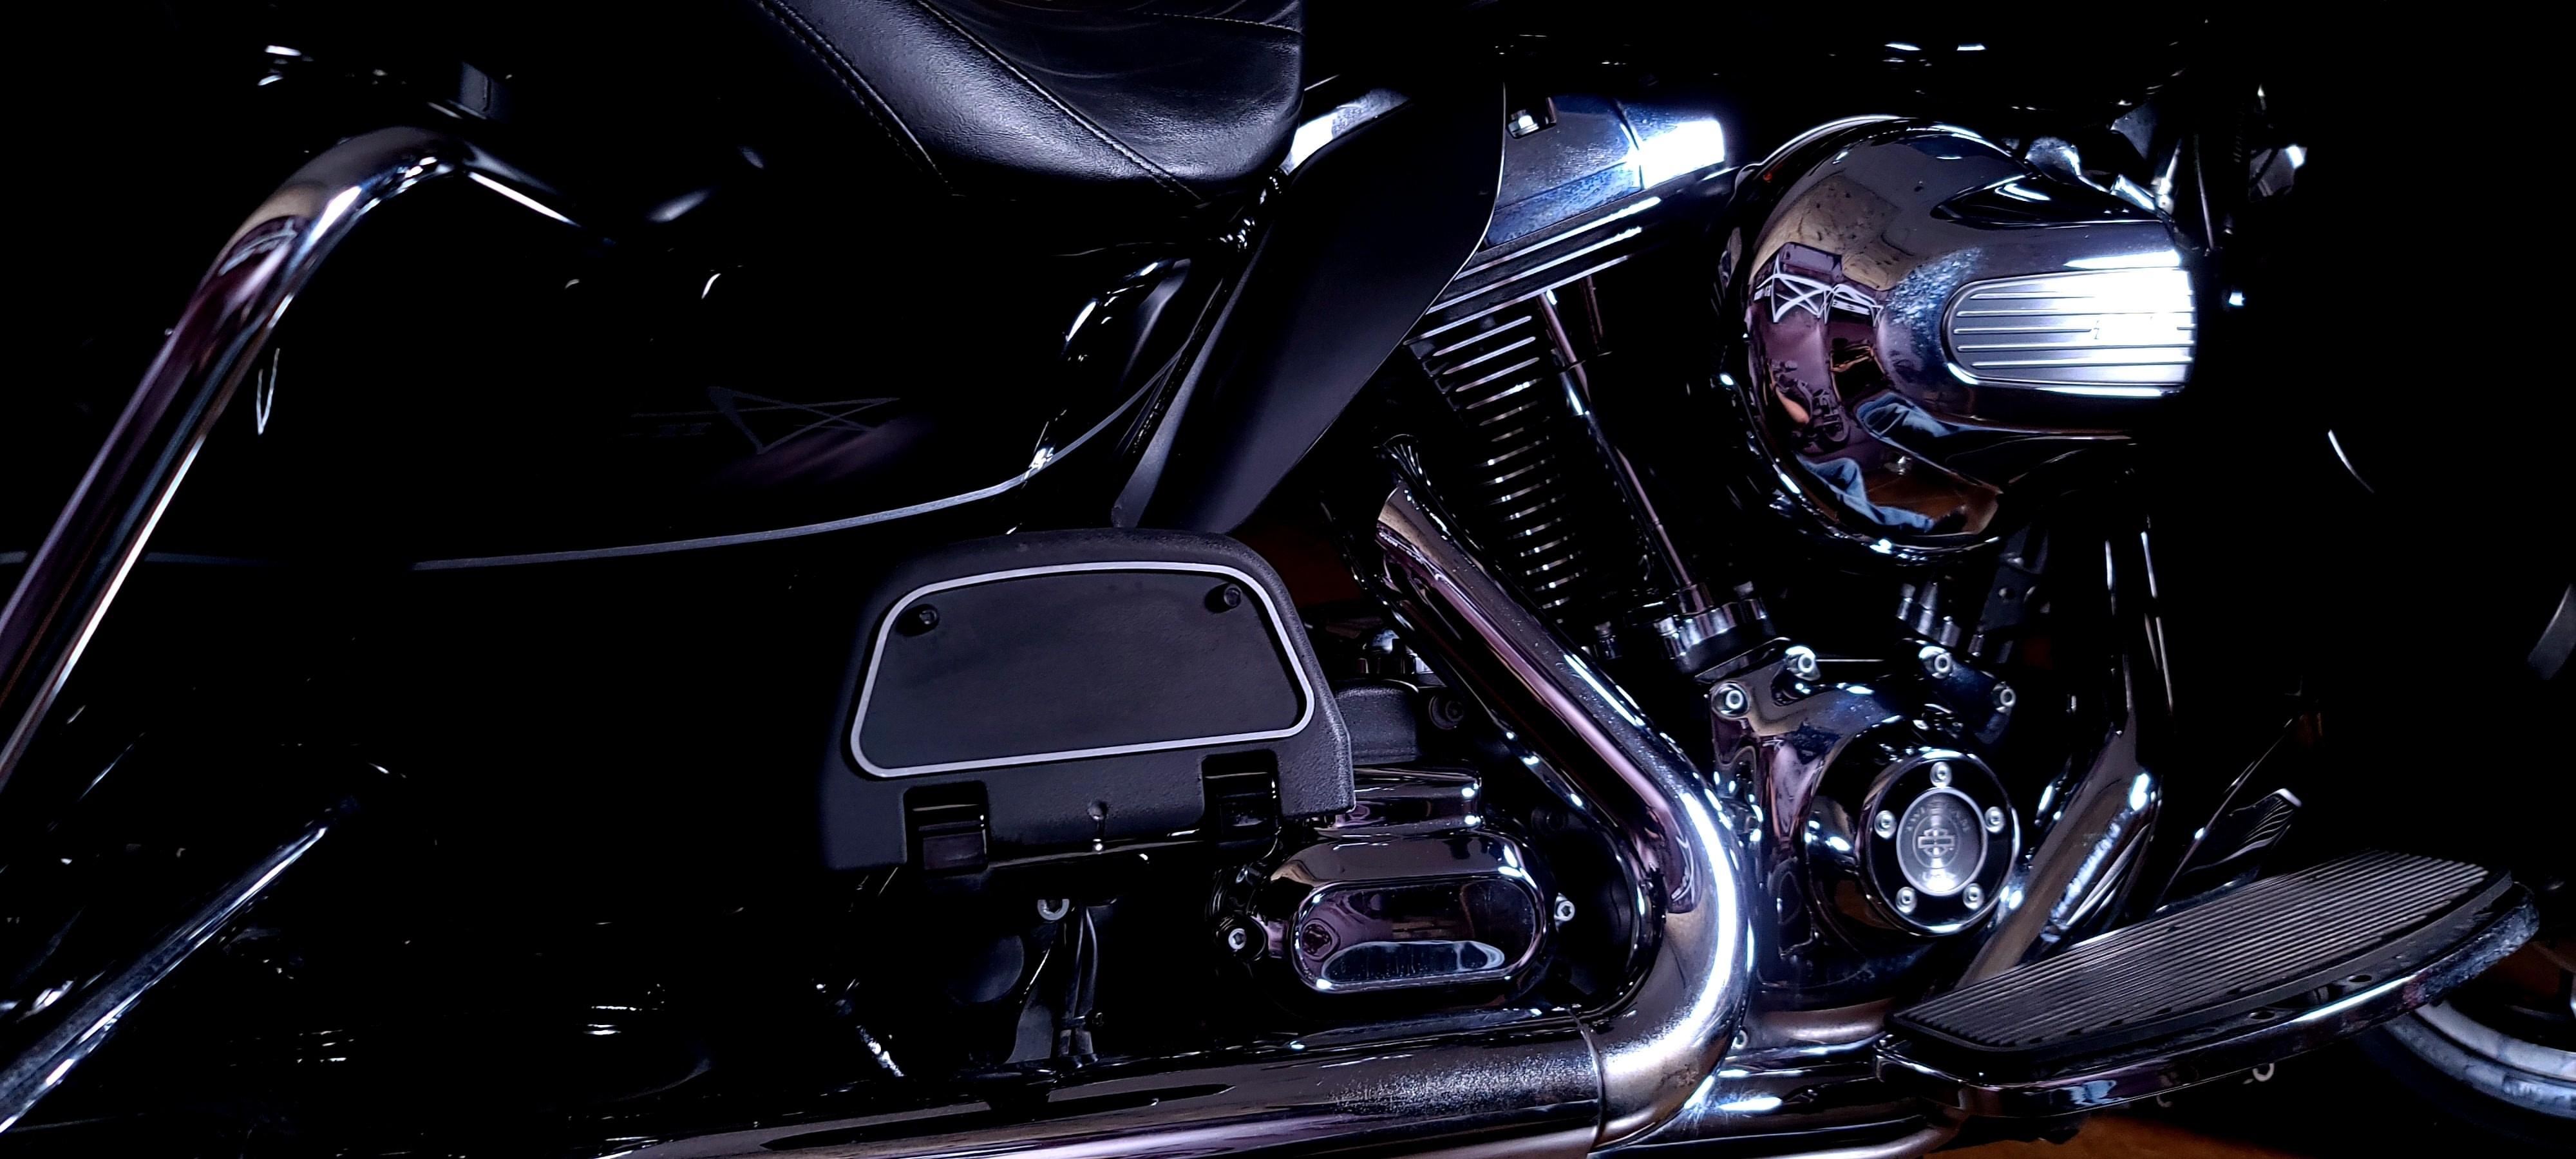 2015 Harley-Davidson Electra Glide Ultra Limited at Harley-Davidson of Waco